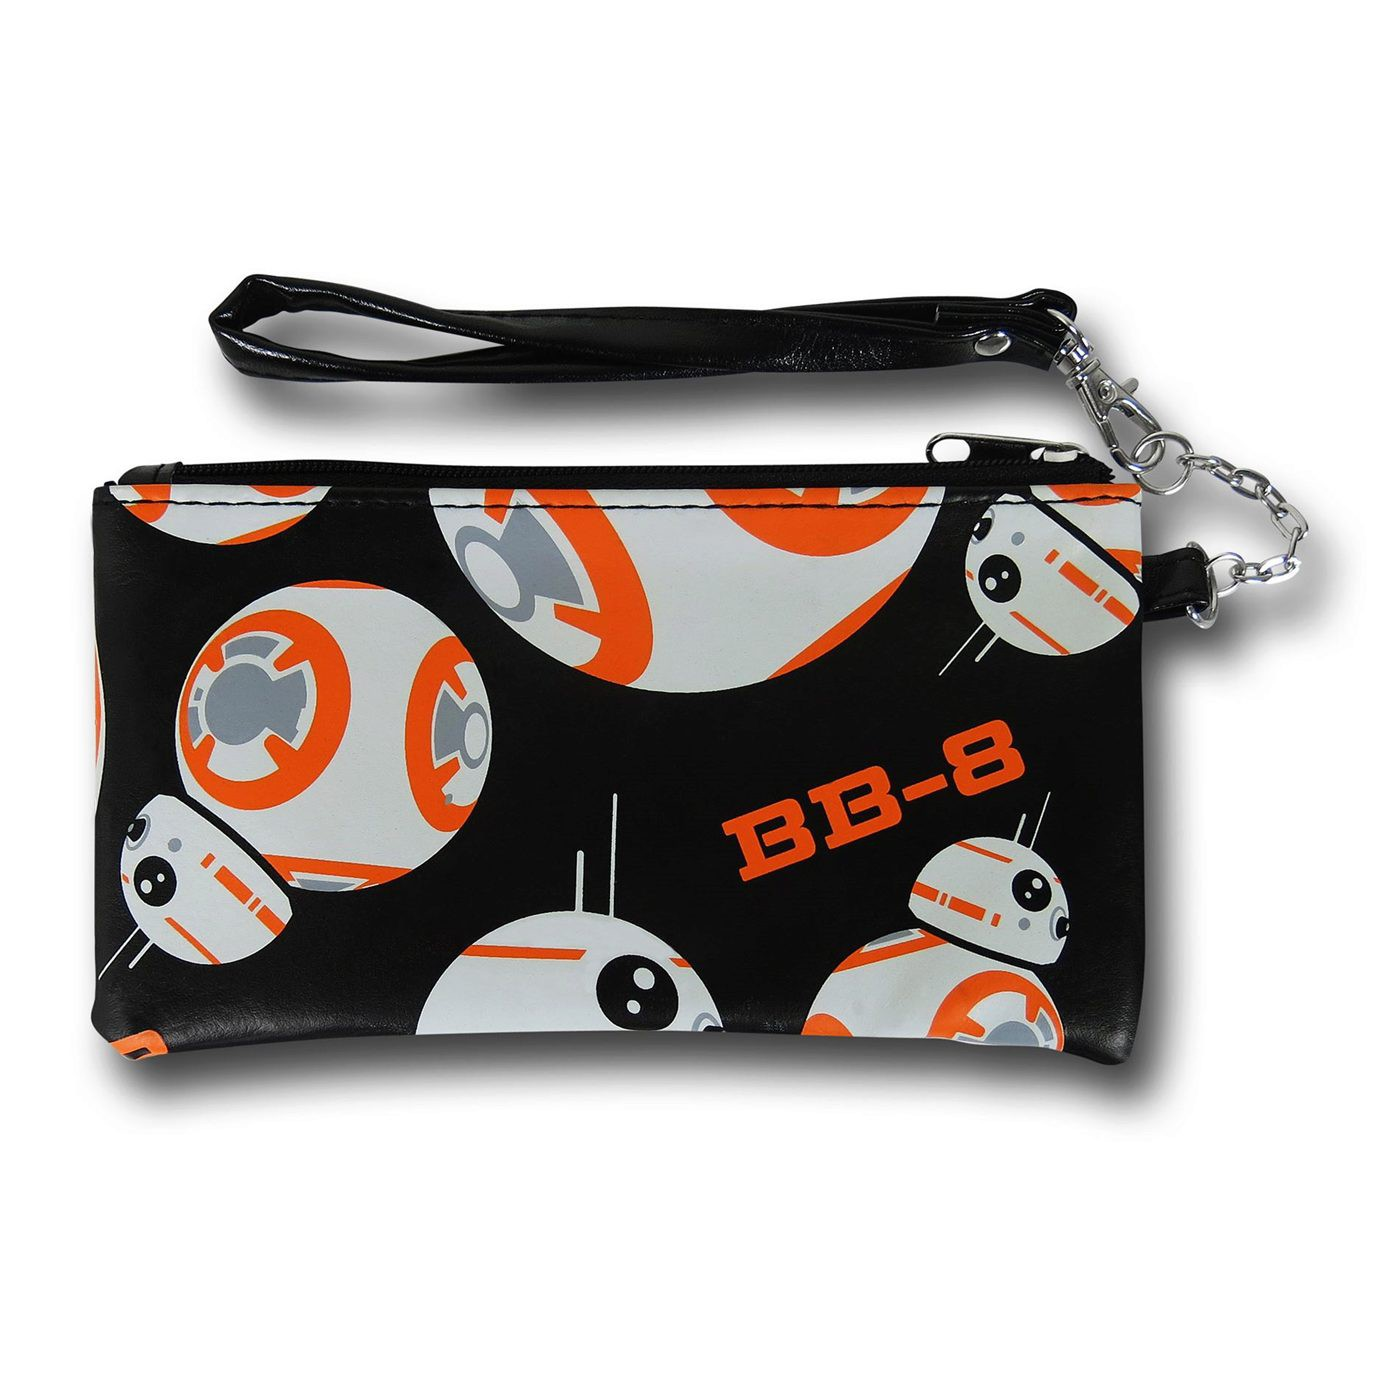 Star Wars The Force Awakens BB-8 Wristlet Wallet